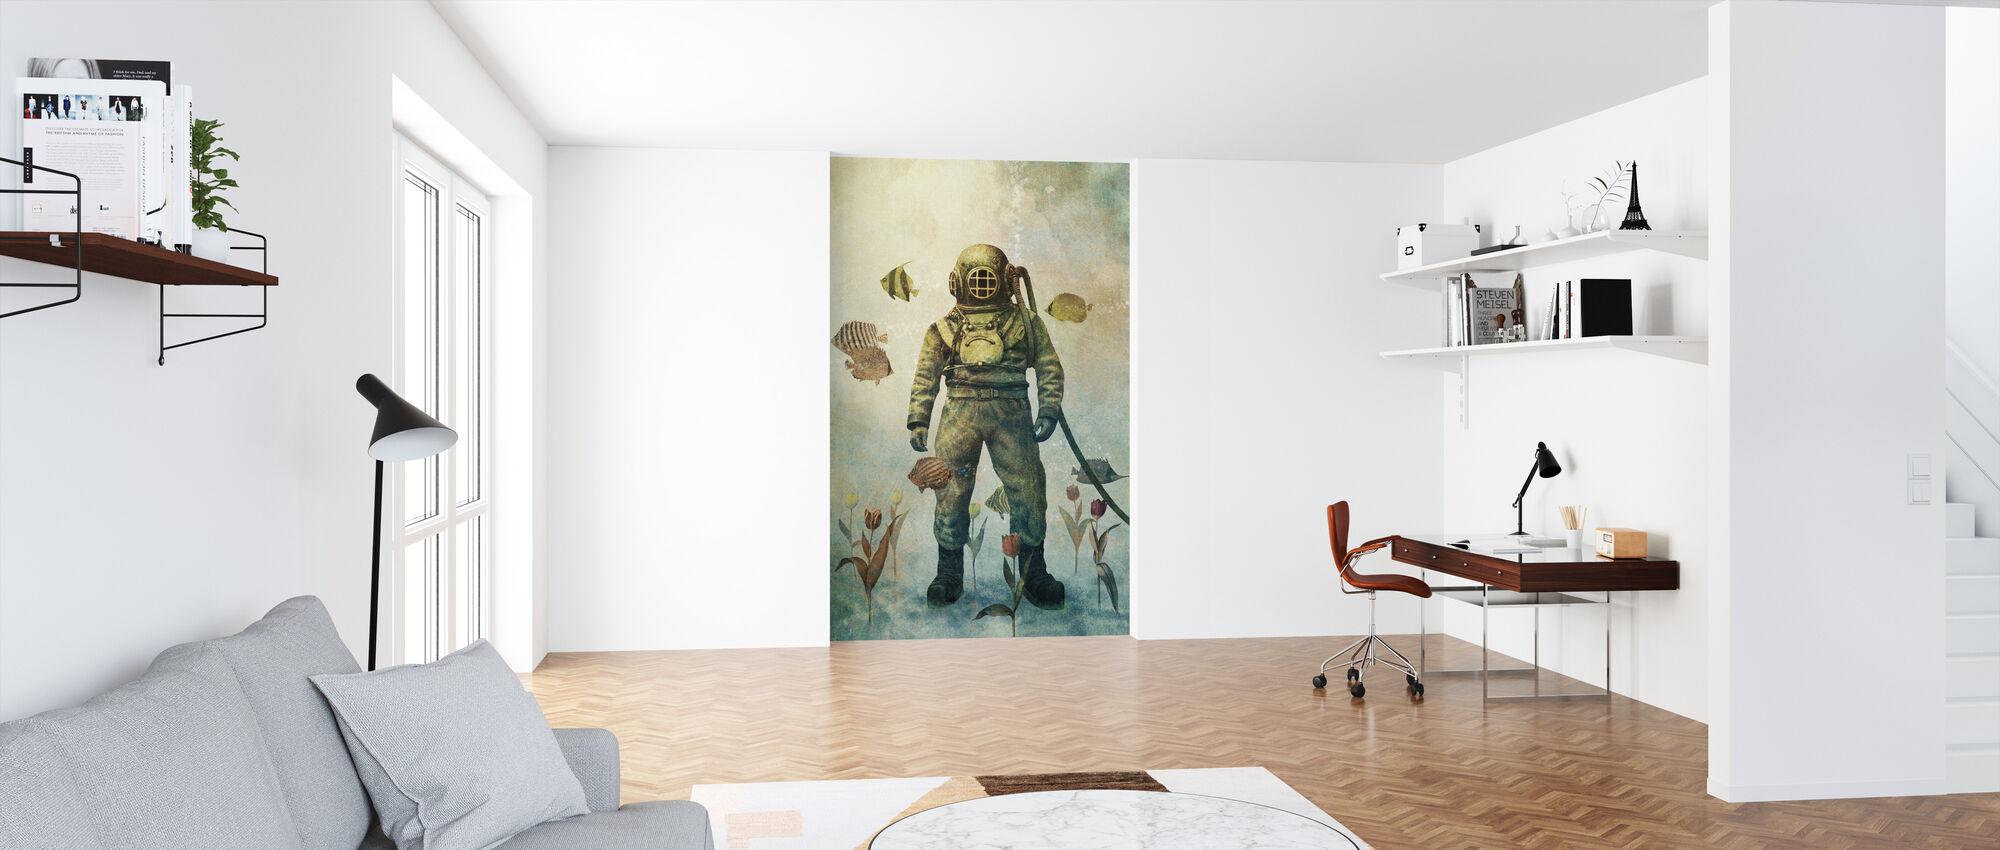 Deep Sea Garden - Wallpaper - Office